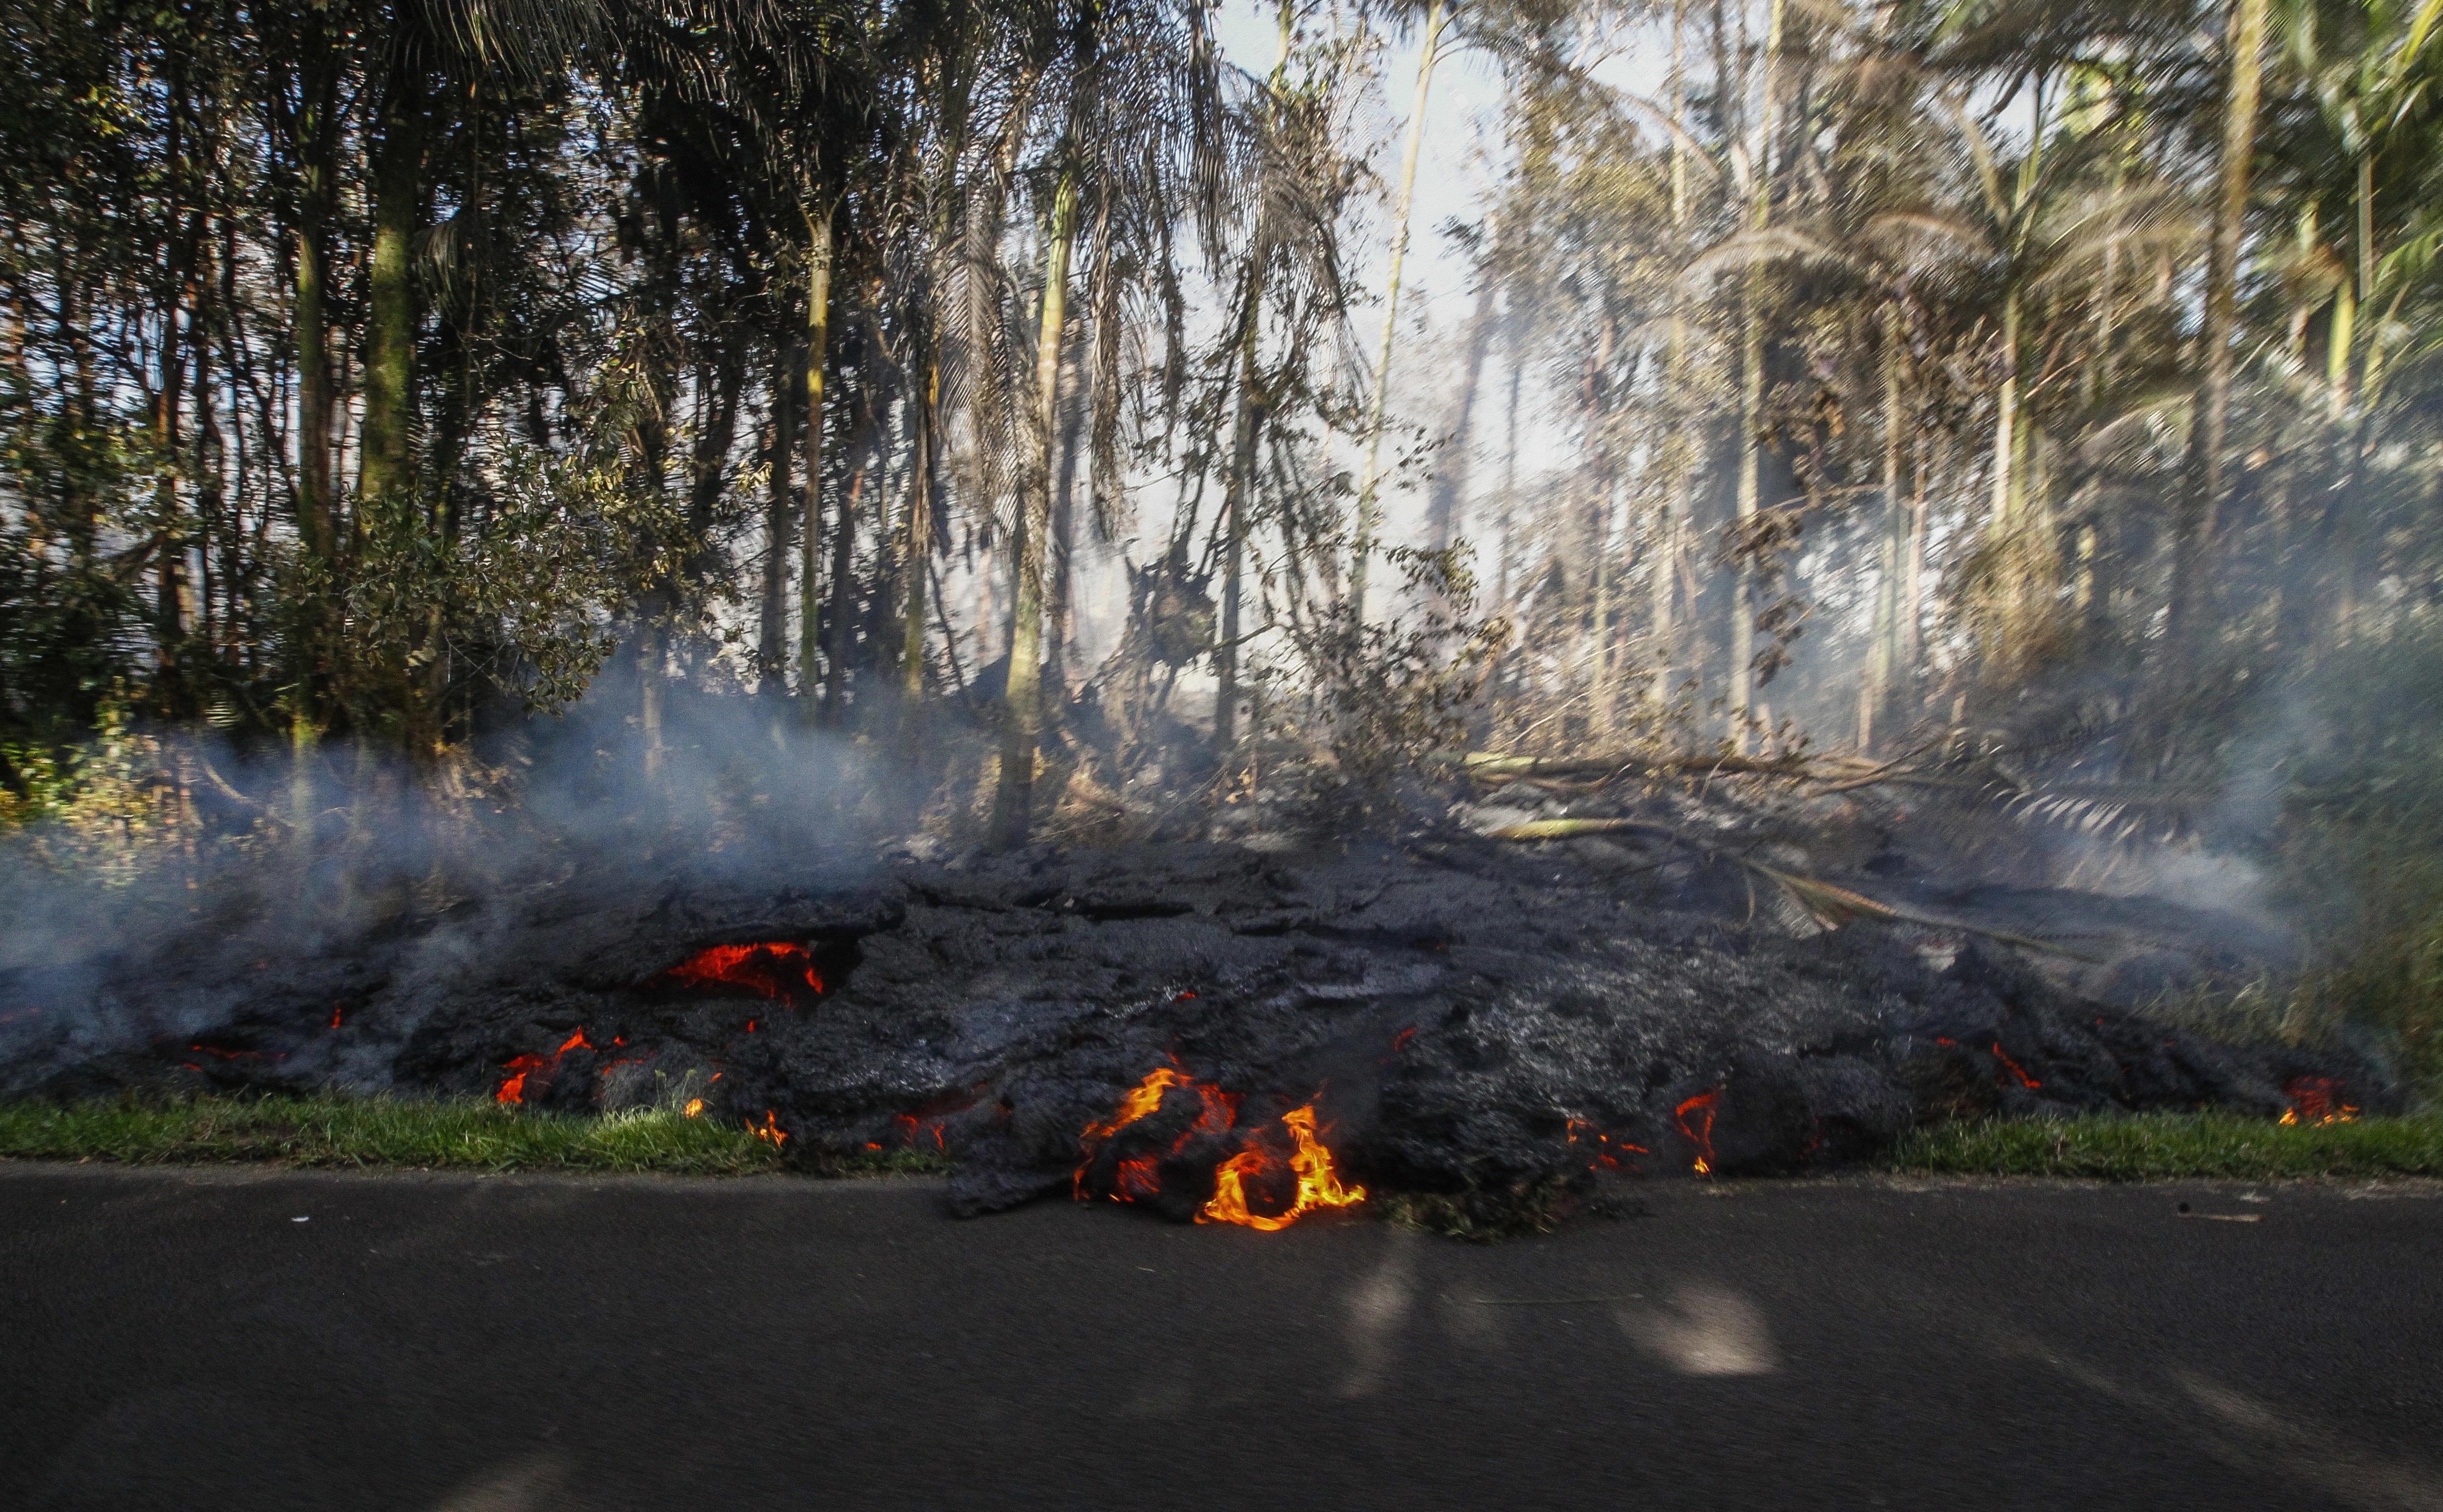 Lava creeps onto the pavement on Luana Street in the Leilani Estates subdivision in Pahoa, Hawaii, on Sunday, May 6, 2018. Photo: Associated Press